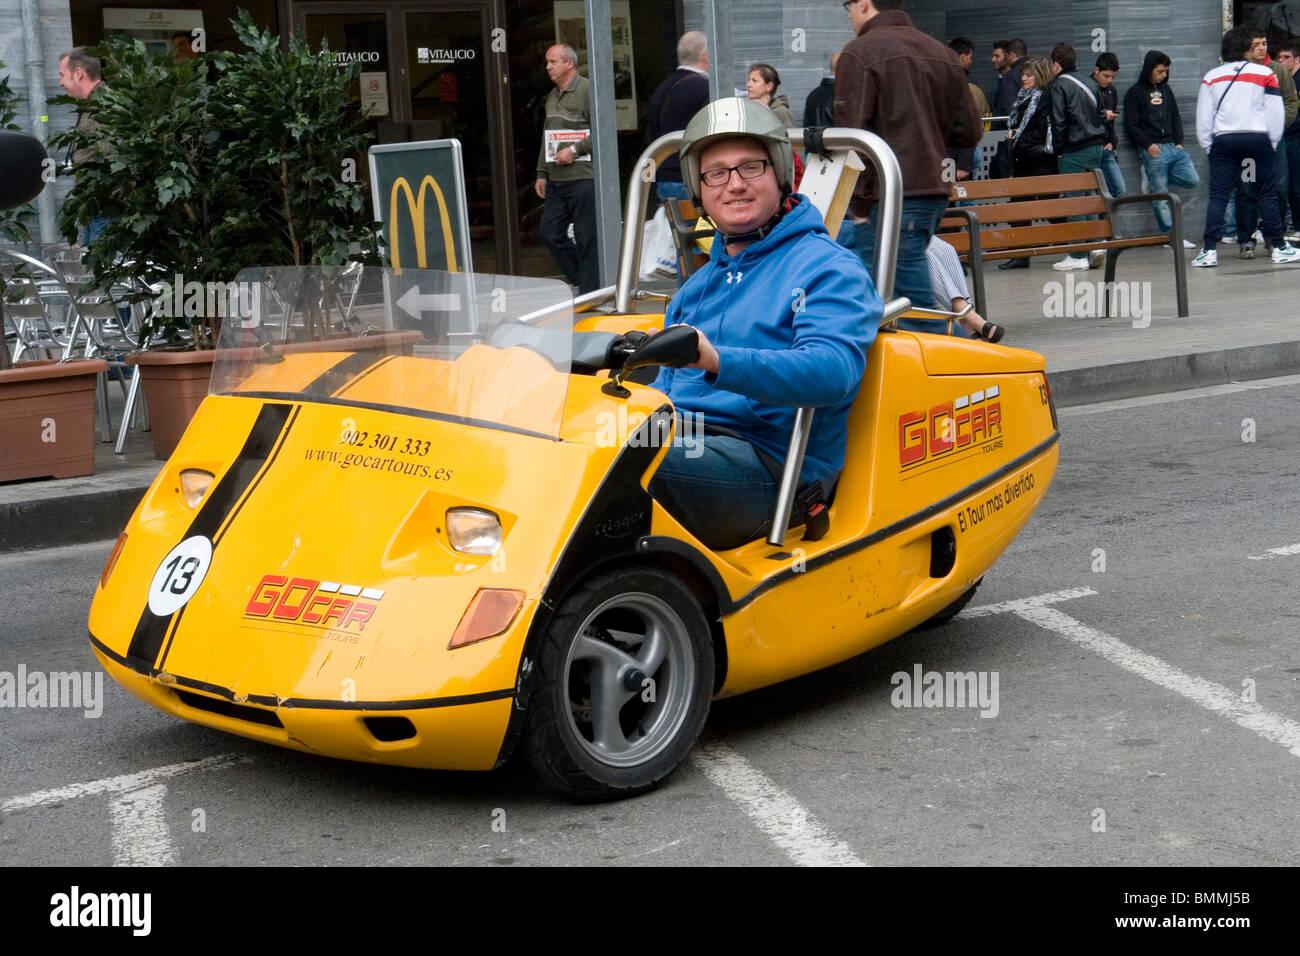 A tourist visiting Barcelona thanks to a rented car (Spain). Touriste visitant Barcelone au moyen d'une voiture - Stock Image